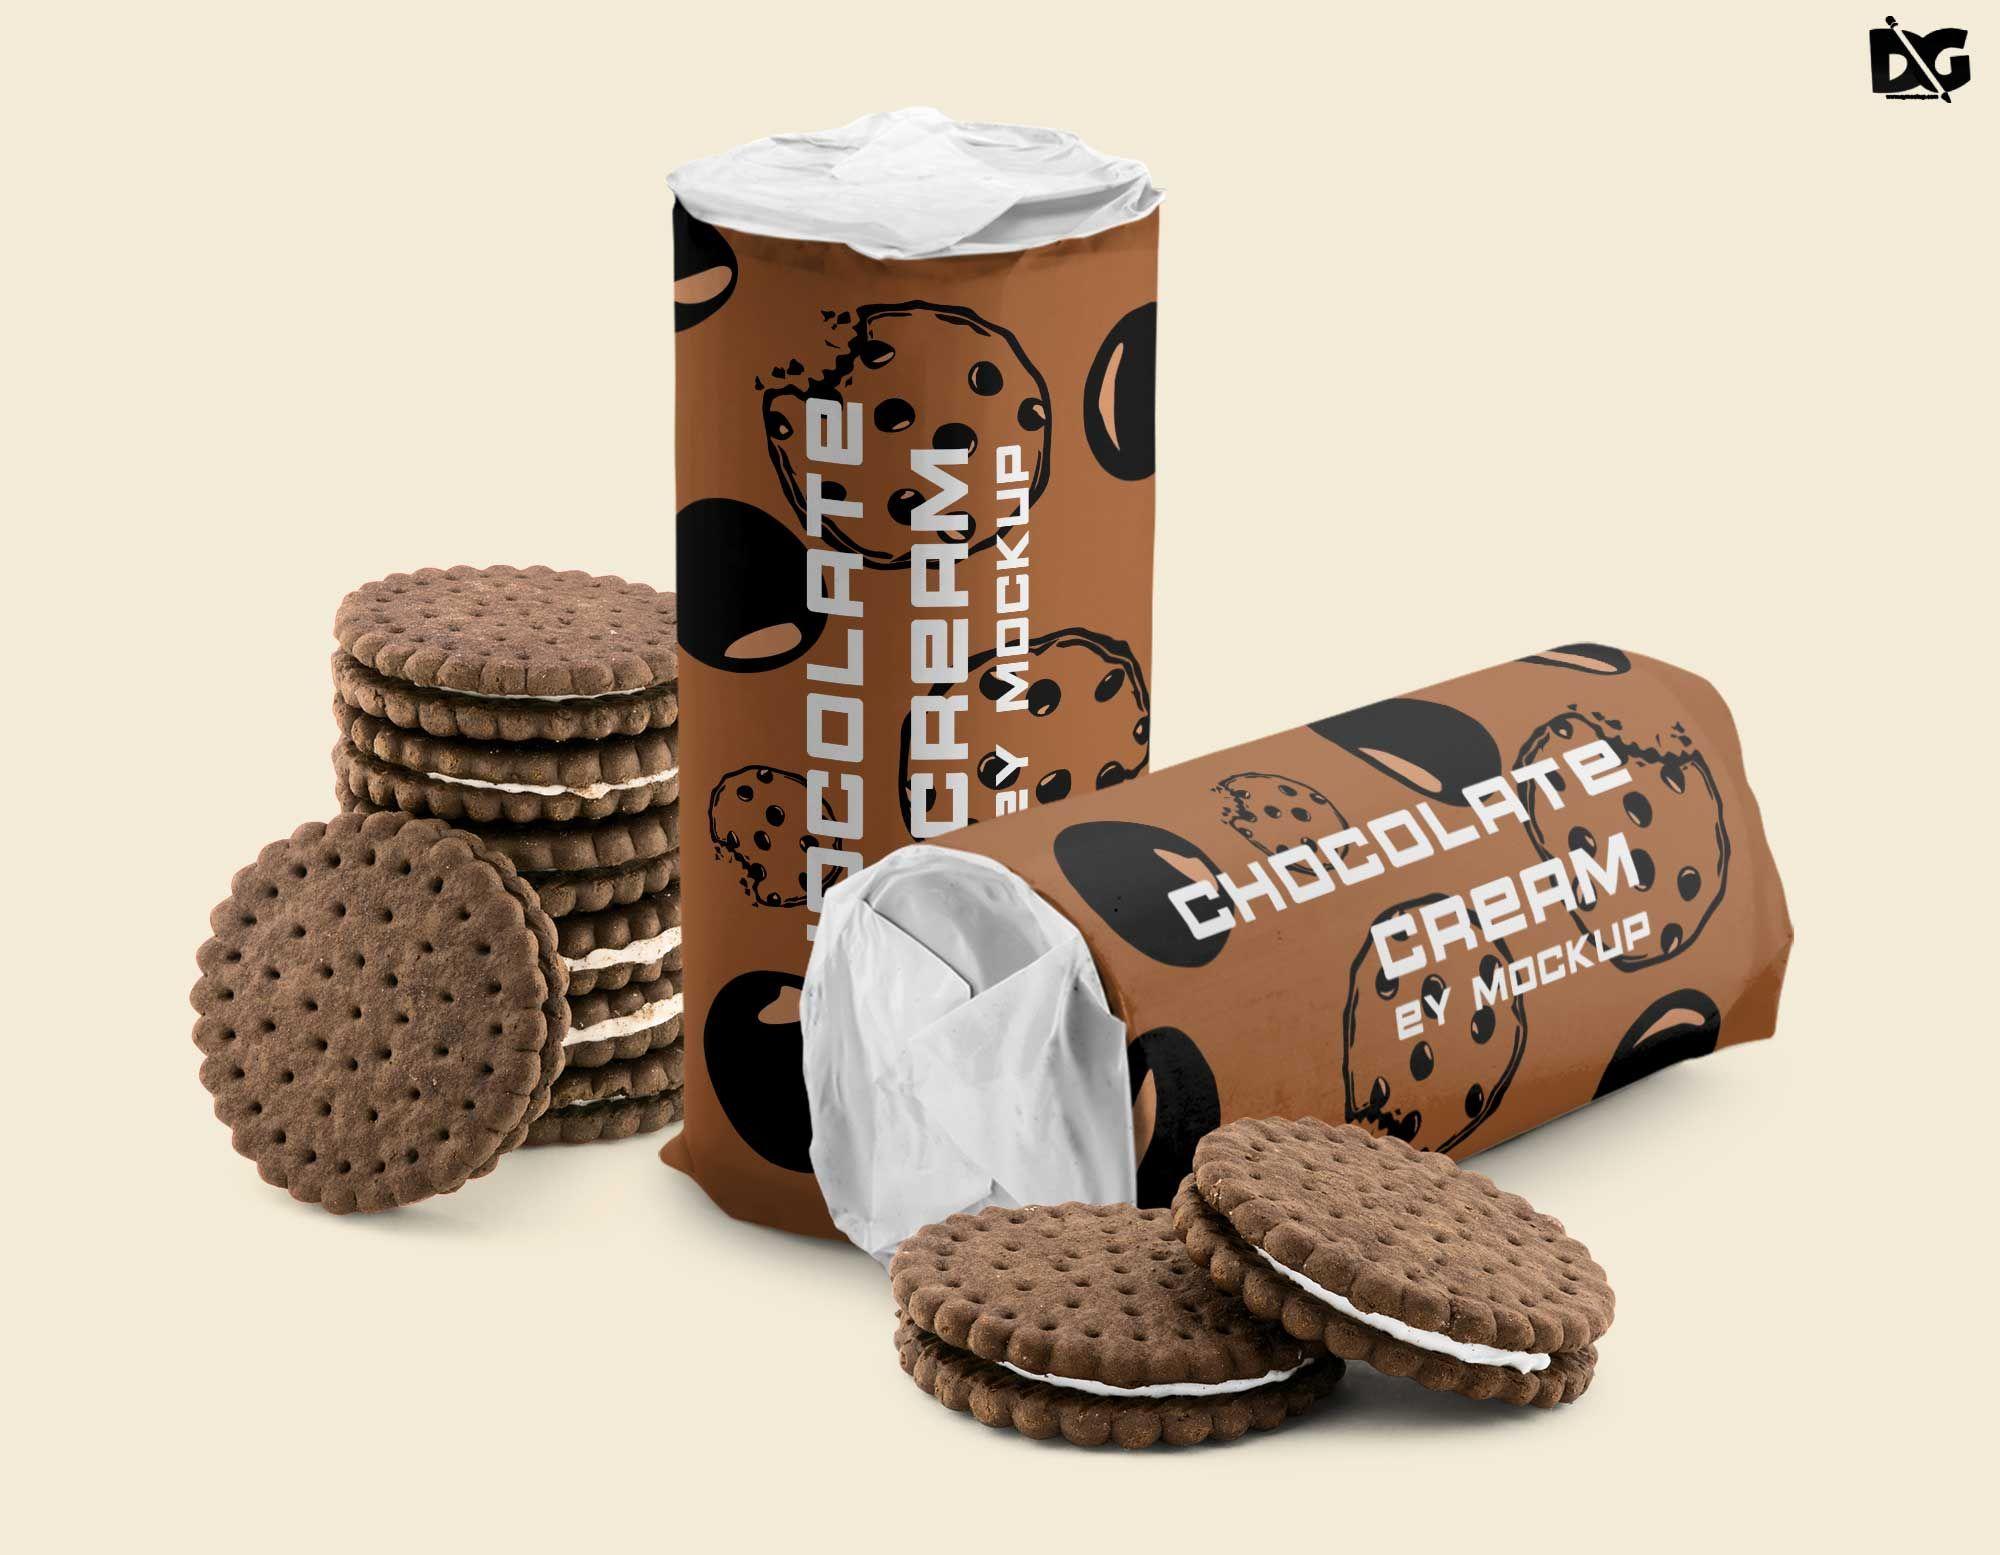 Free Psd Chocolate Cream Packaging Mockup Chocolate Cream Packaging Mockup Chocolate